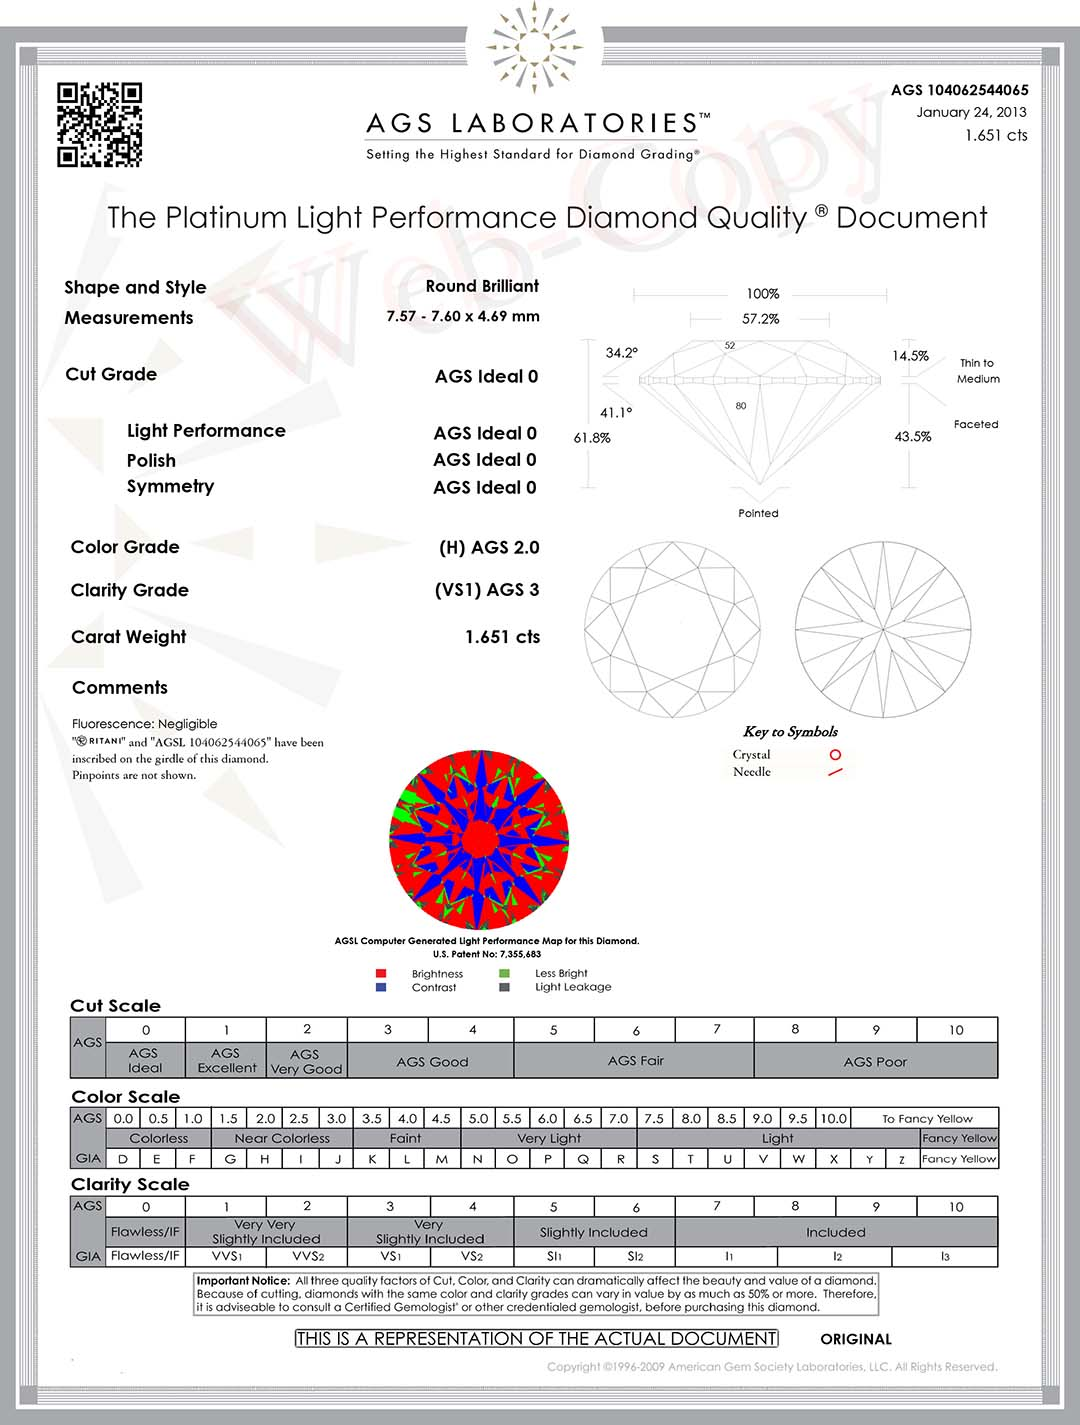 Ritani Diamond Reviews AGS Ideal 0 Cut ASET Map.